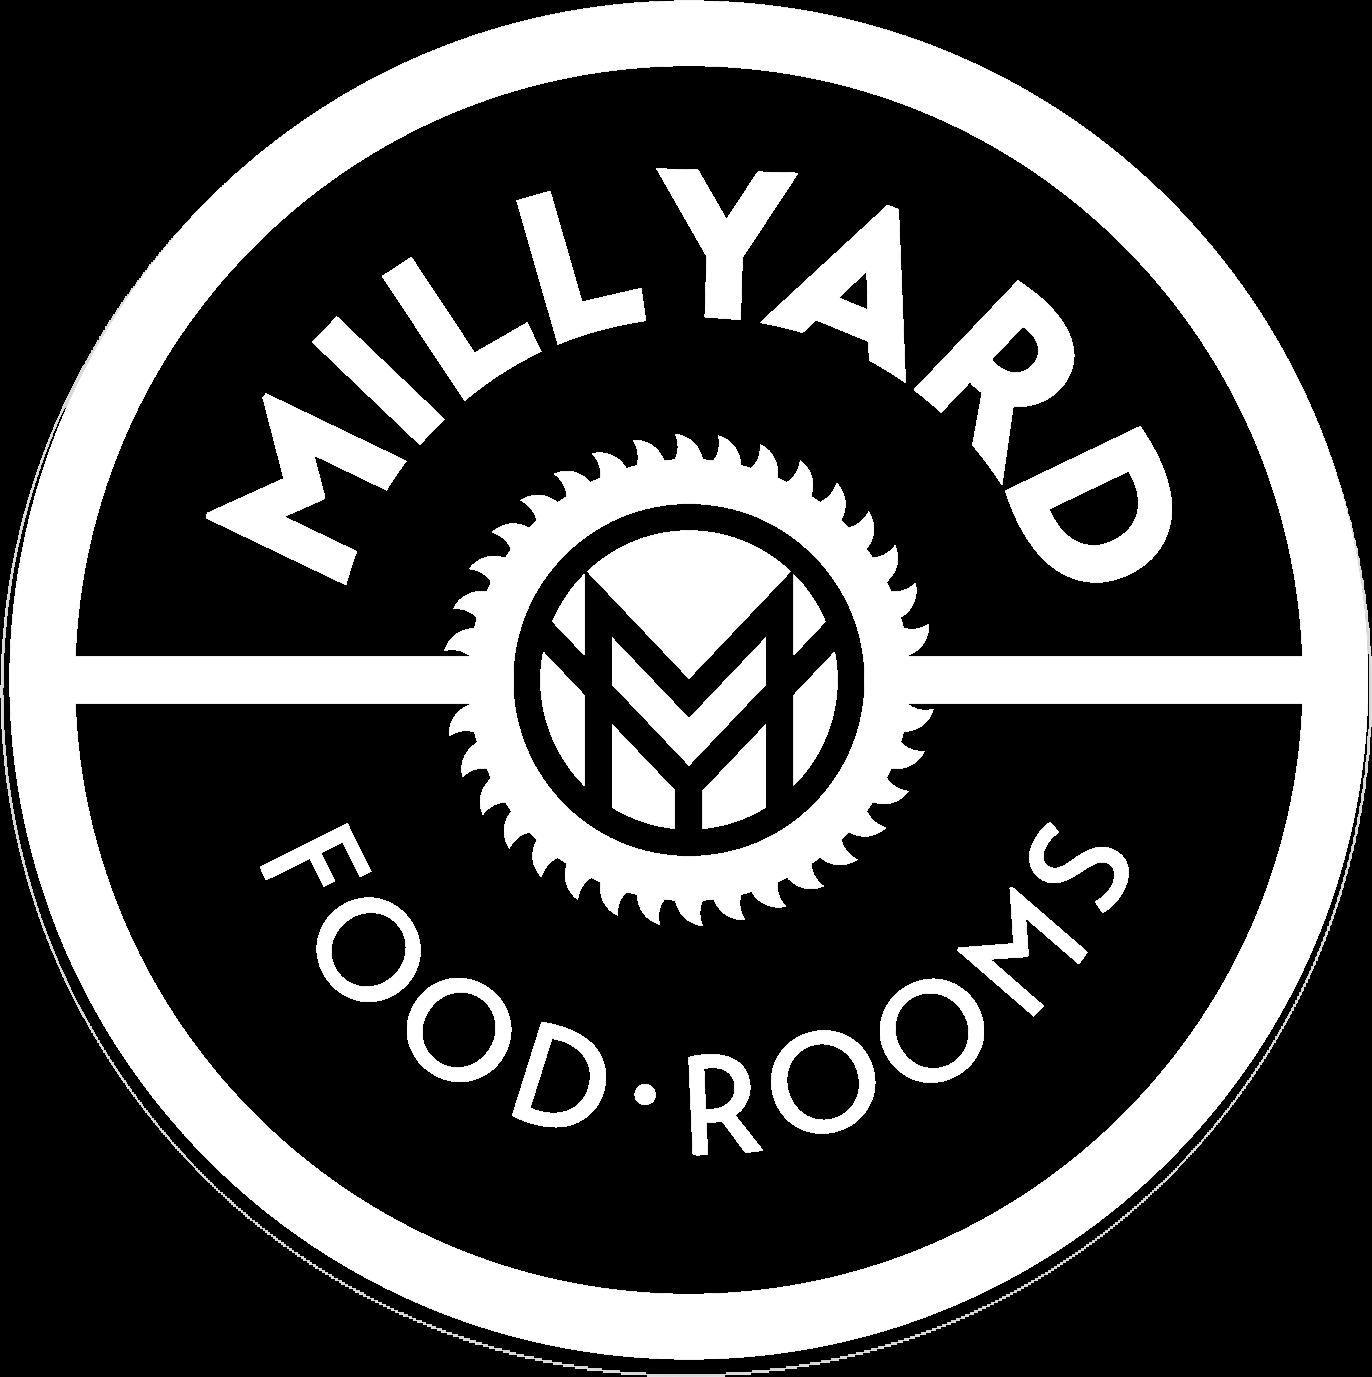 The Millyard logo